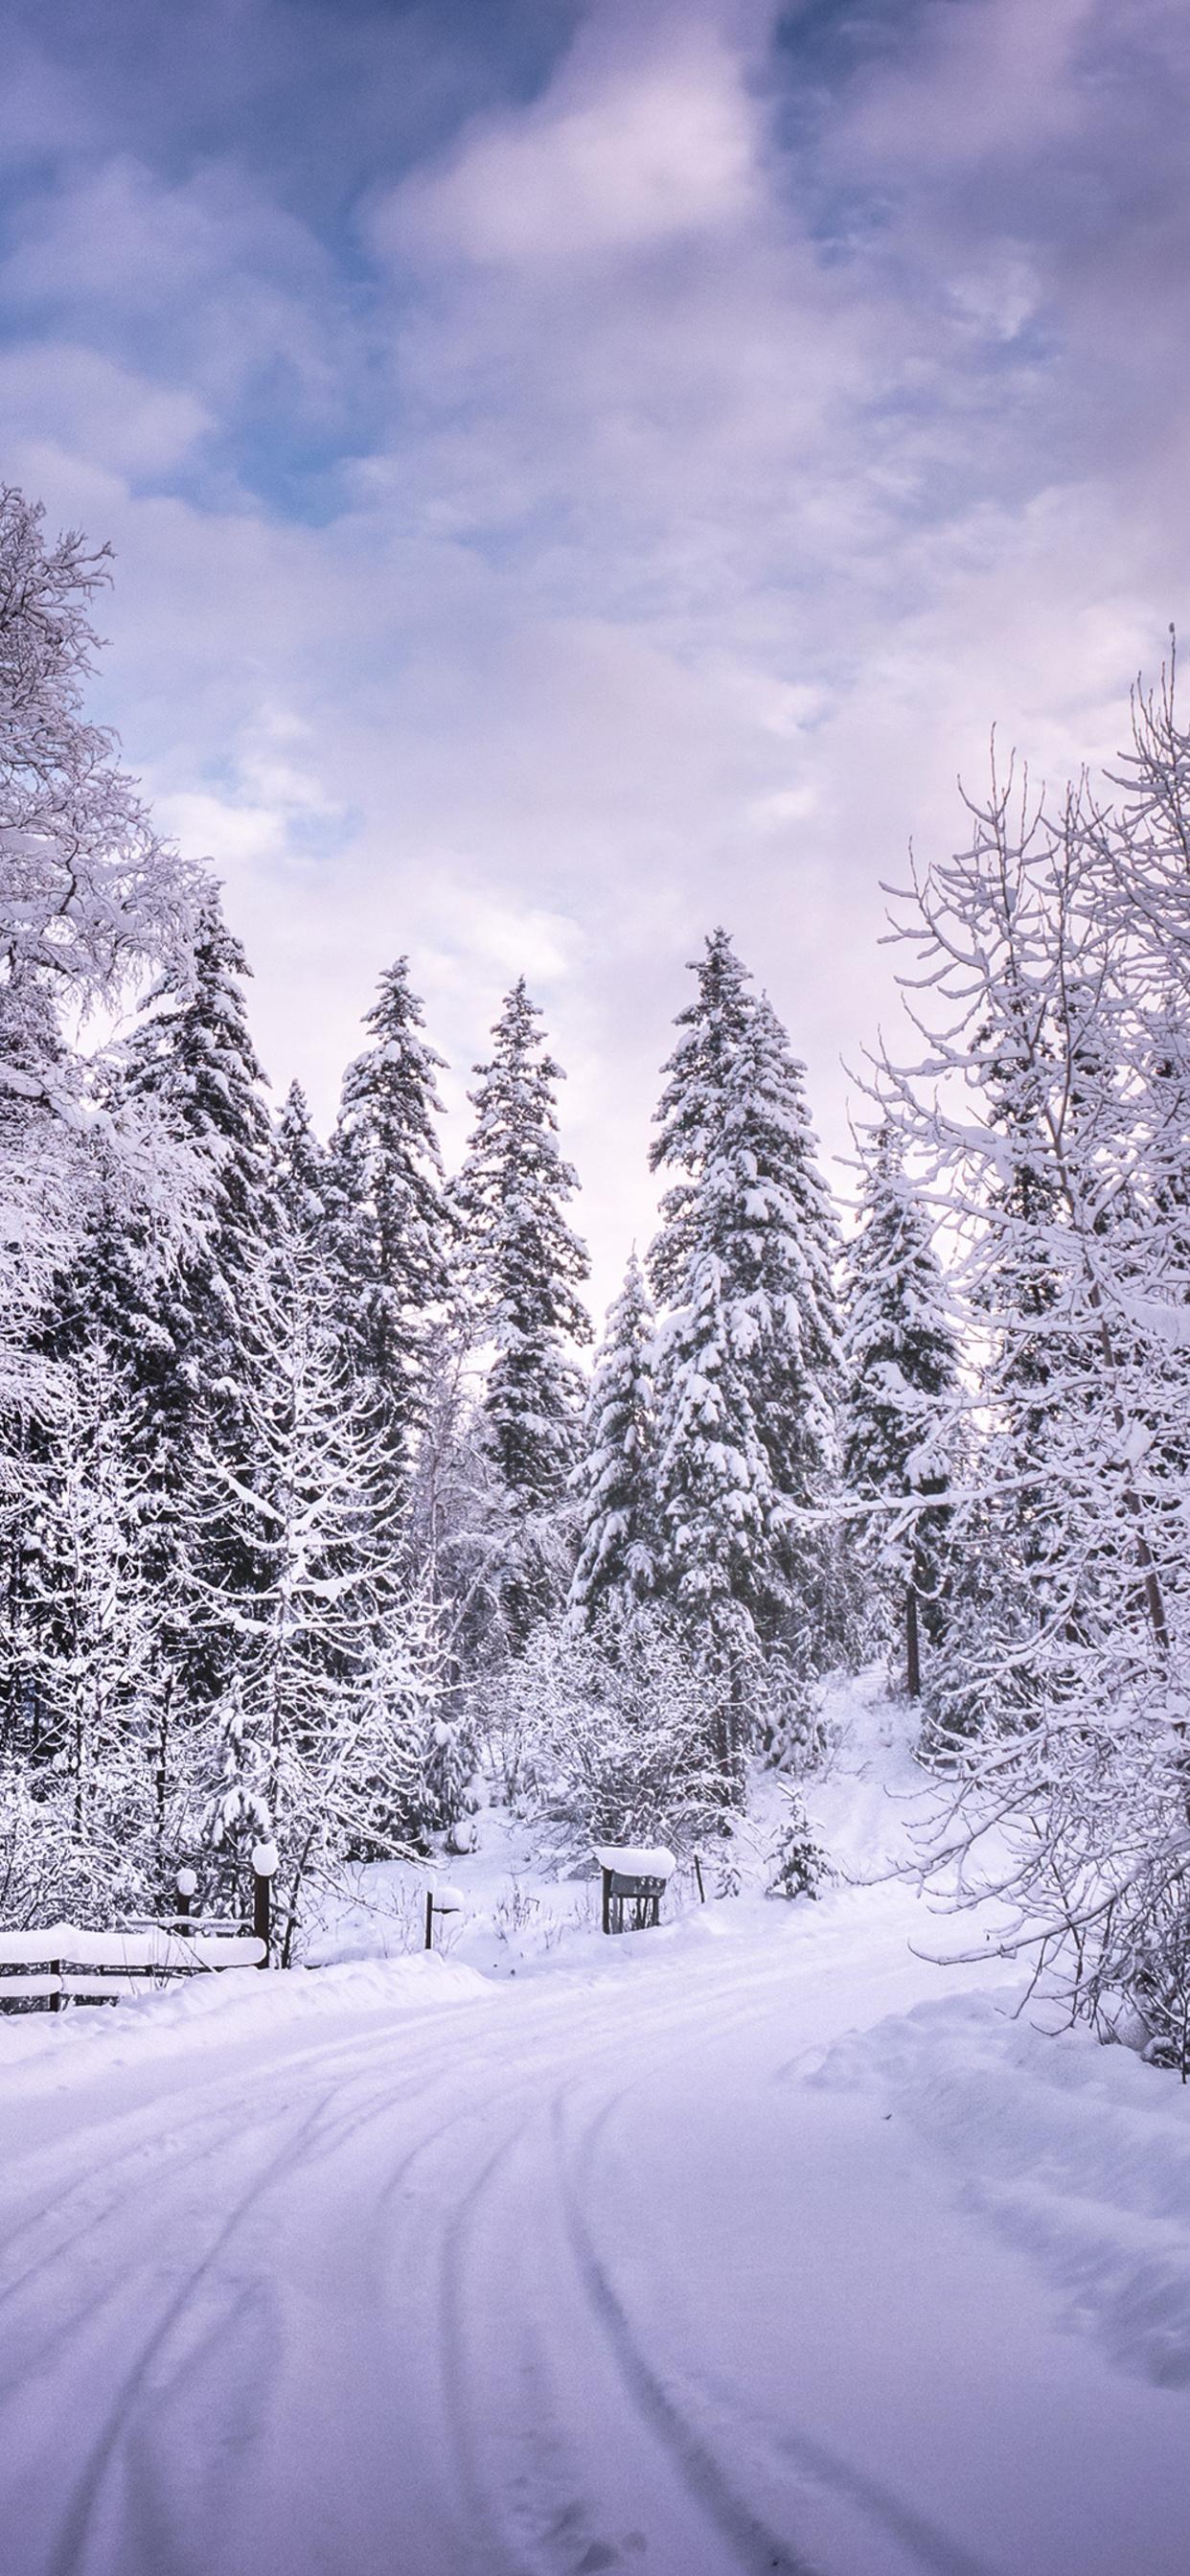 1242x2688 Winter Road Snow Trees White Iphone Xs Max Hd 4k